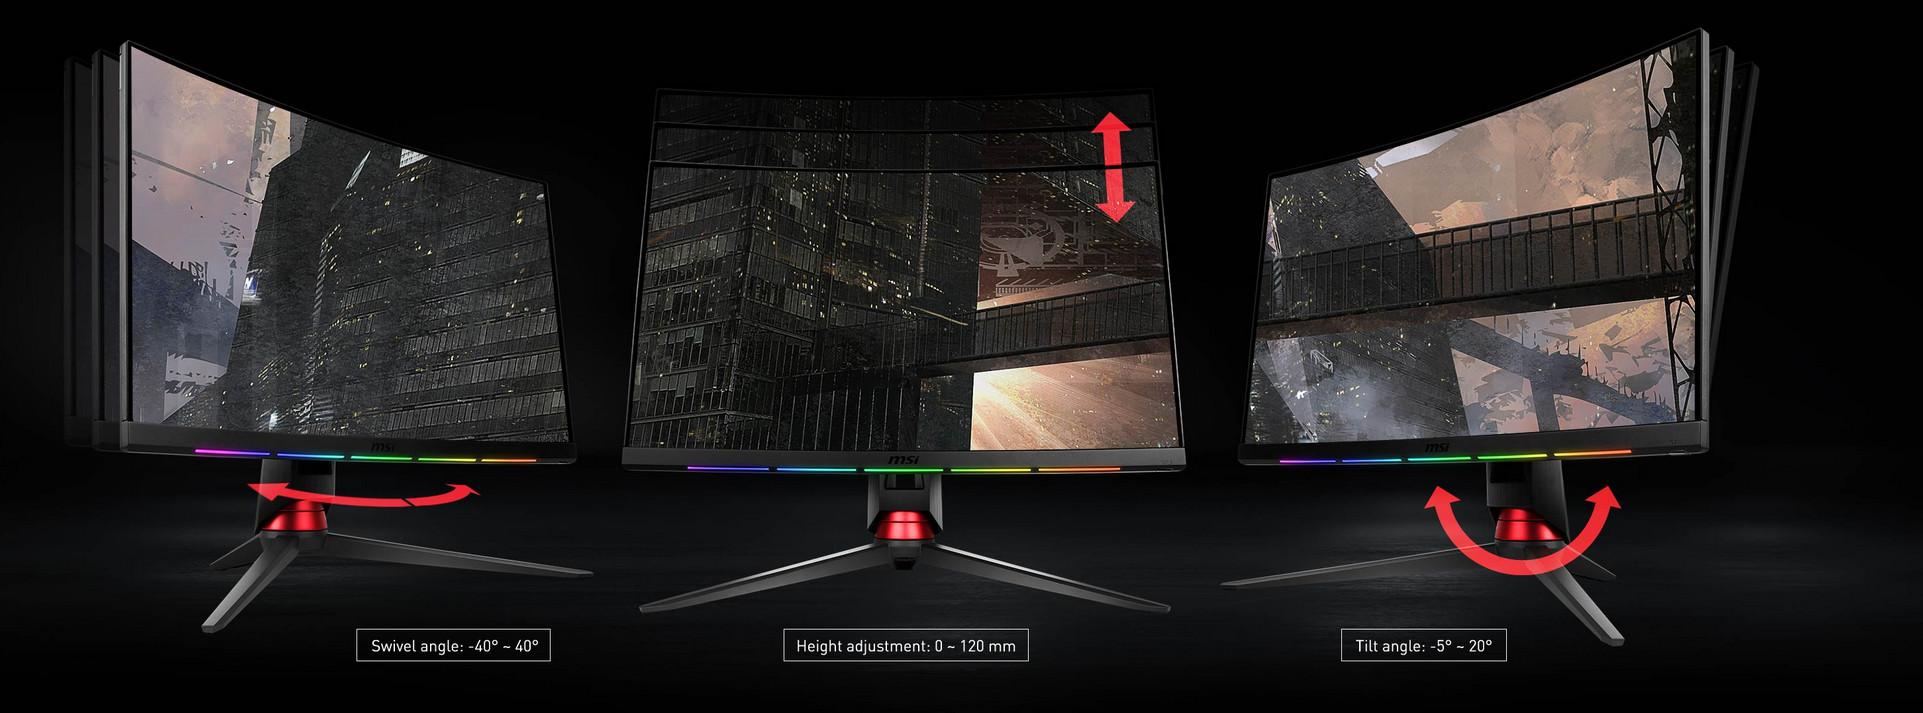 MSI Intros the OPTIX MPG27CQ Monitor 4